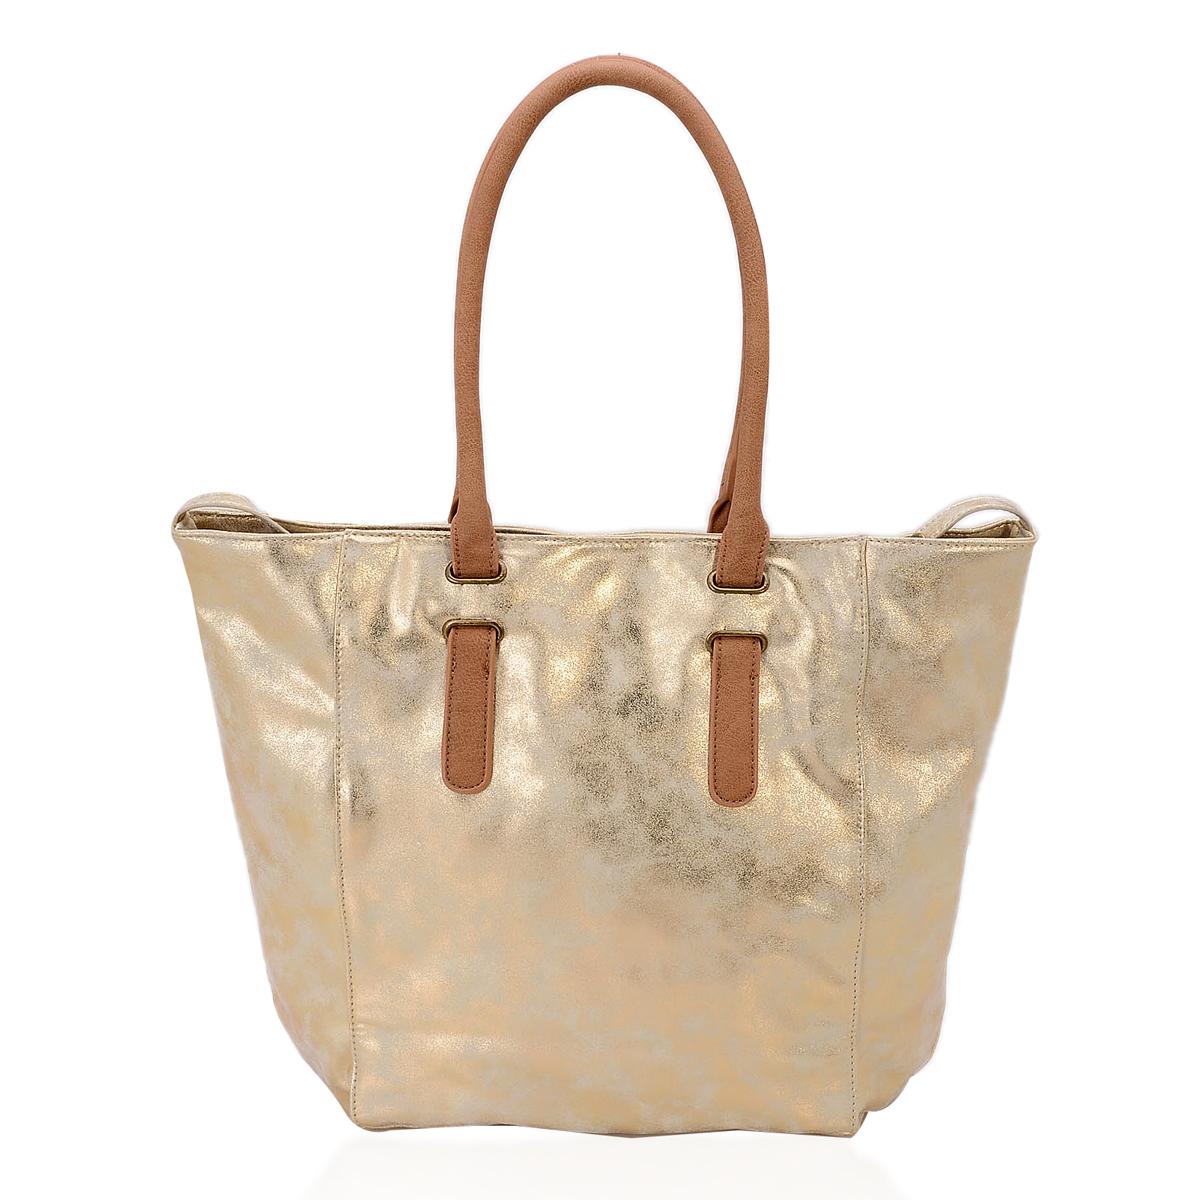 Golden Faux Leather Shoulder Bag (14x5.5x11 in)